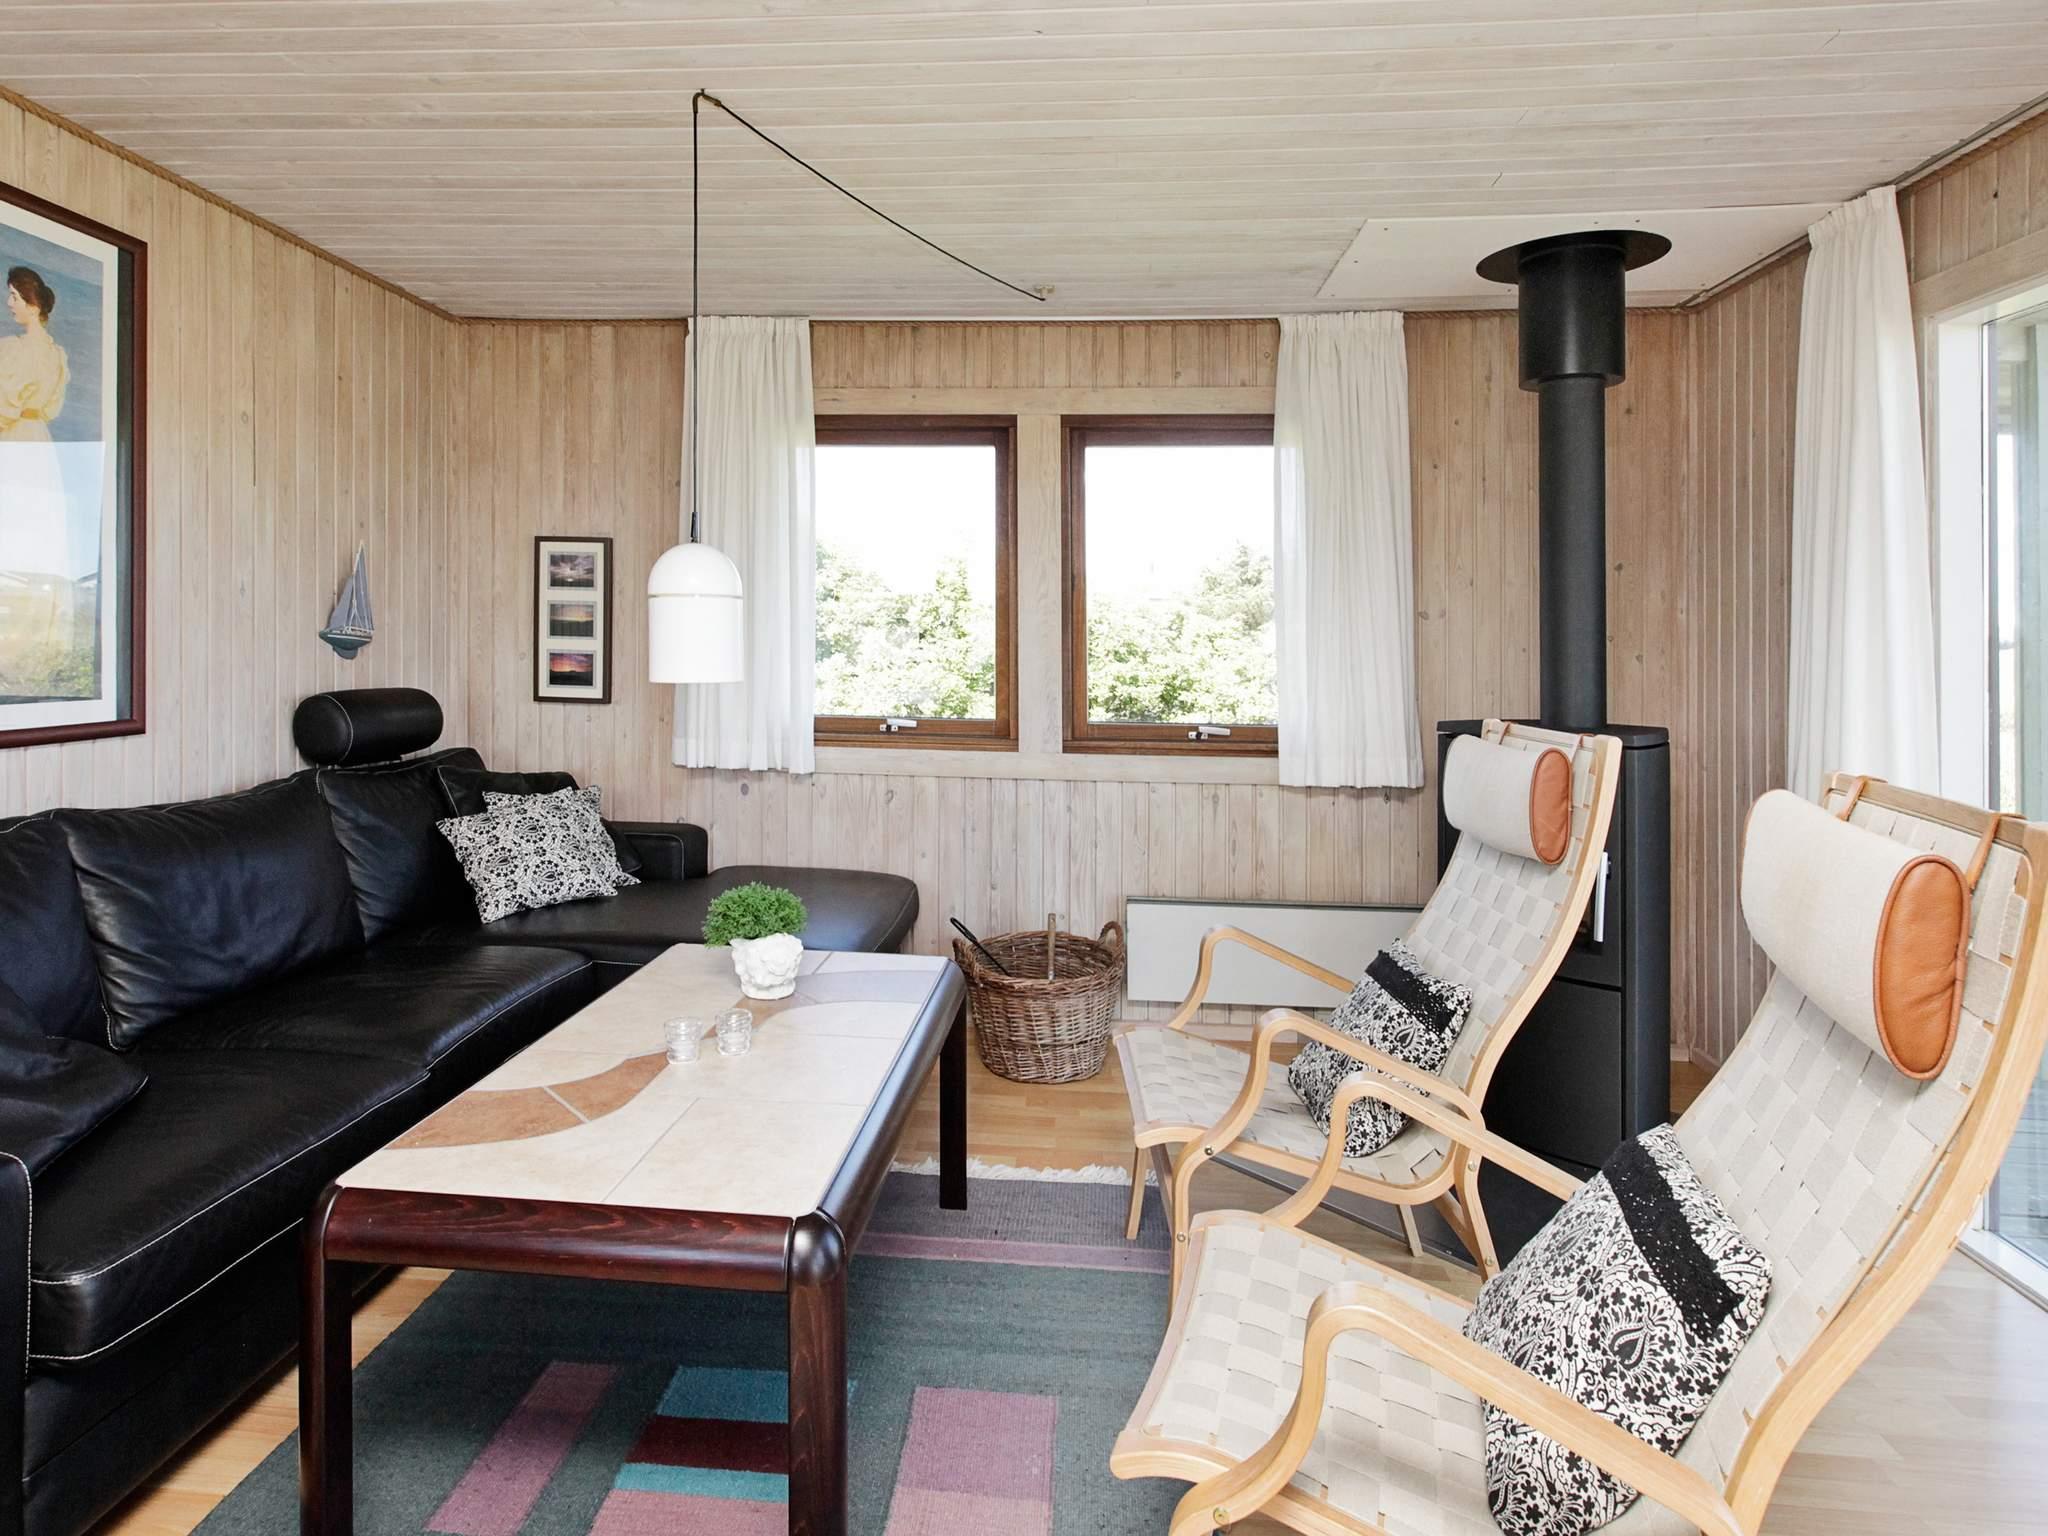 Ferienhaus Grønhøj Strand (83808), Løkken, , Nordwestjütland, Dänemark, Bild 2